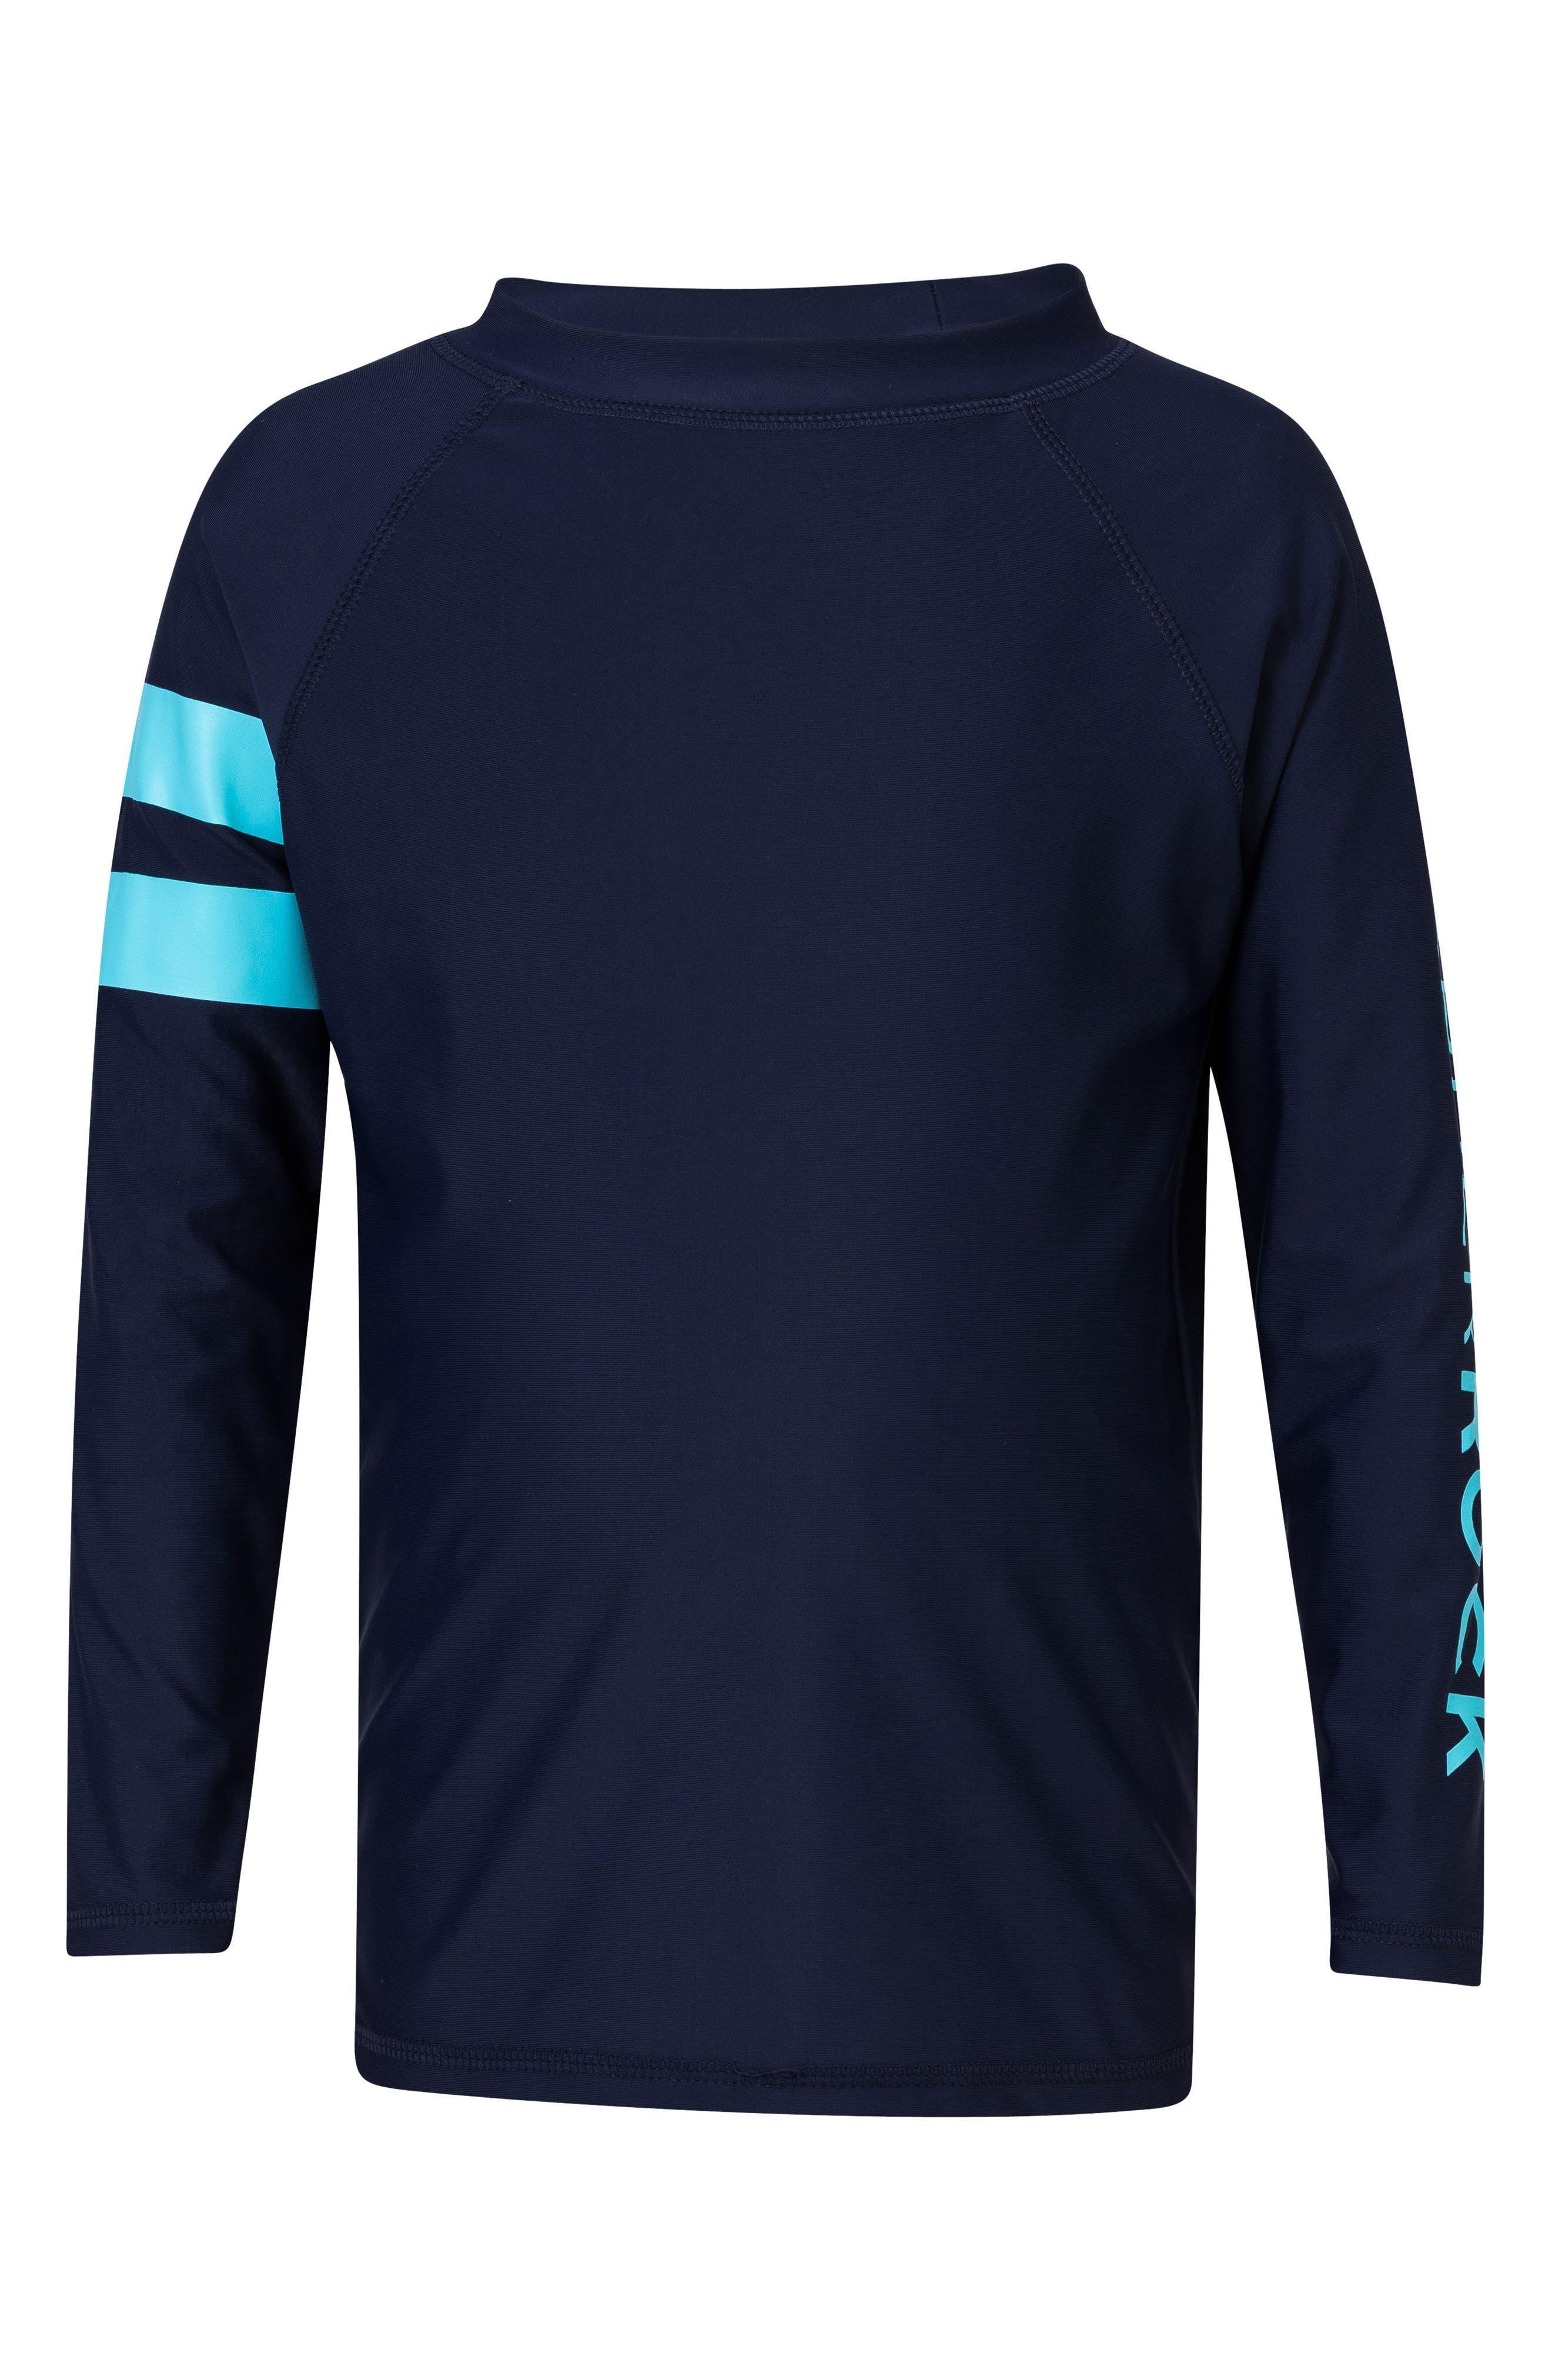 Raglan Long Sleeve Rashguard,                         Main,                         color, Navy/ Light Blue Stripe